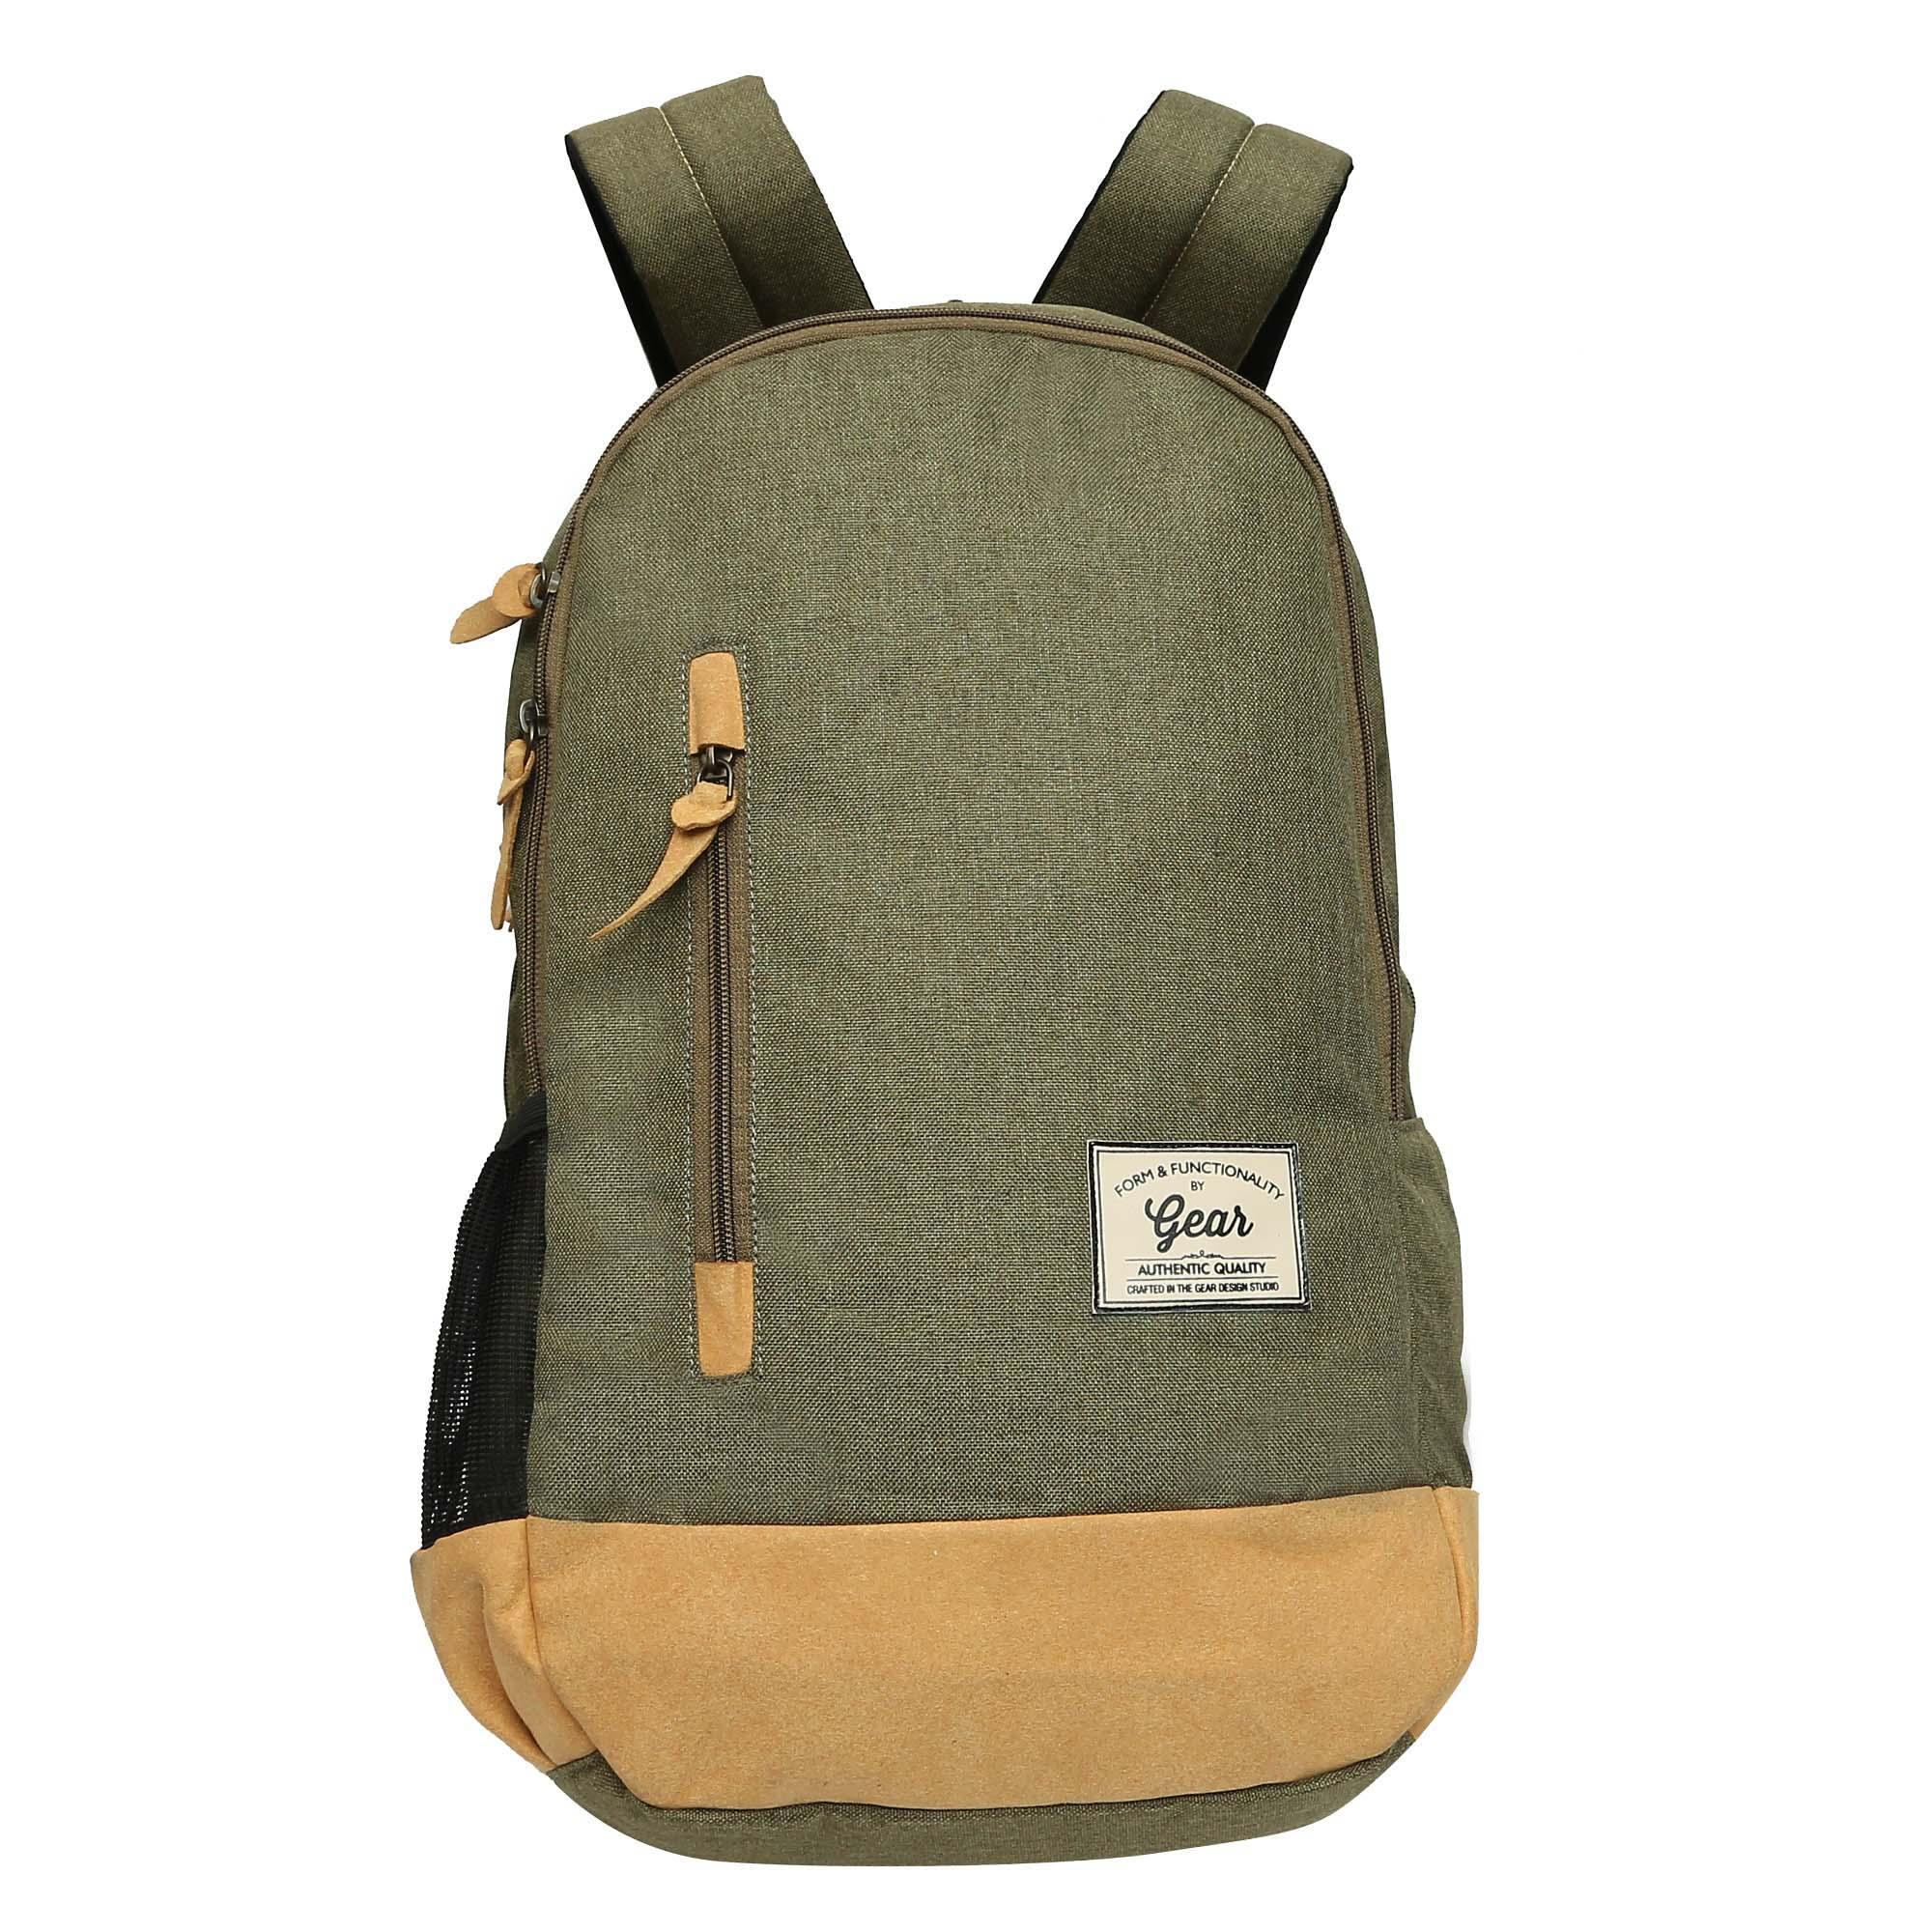 5b6829a91387 Gear Unisex Blue And Black Campus 9 Waterproof Backpack- Fenix ...